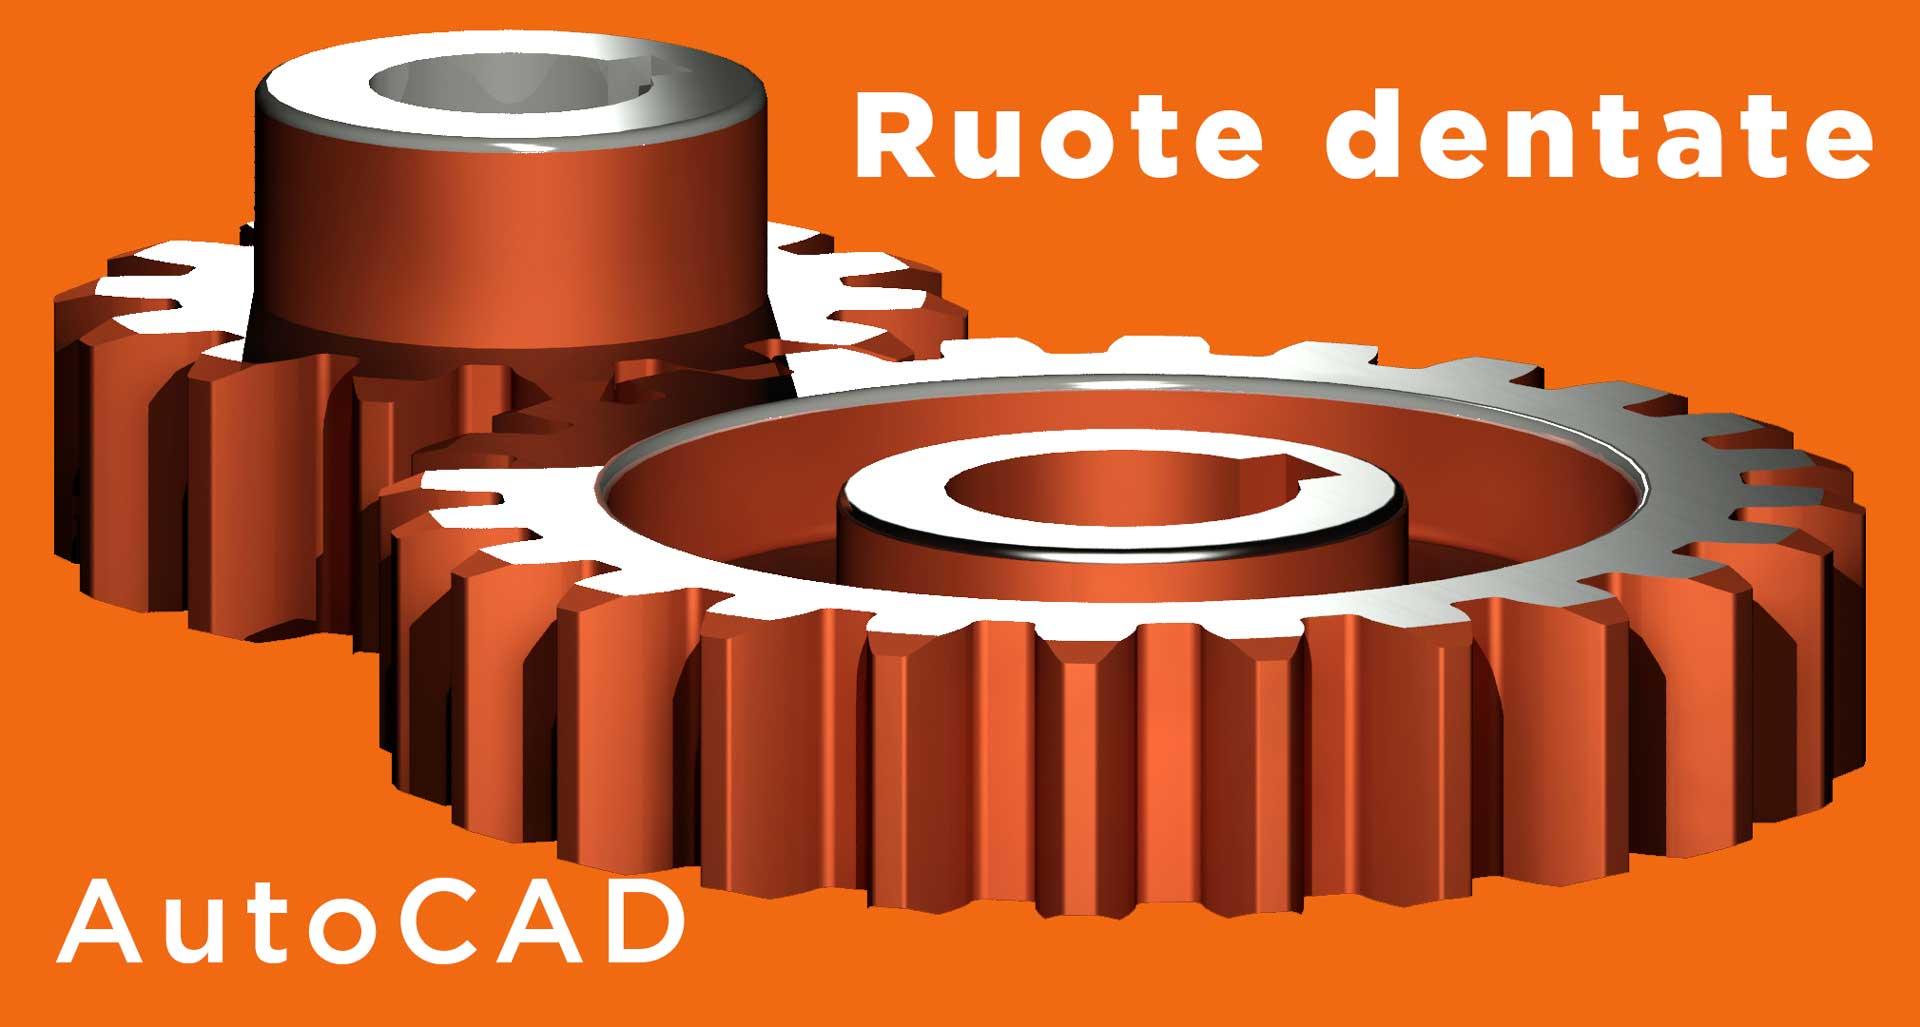 ruota-dentata-evolvente-3d Autocad